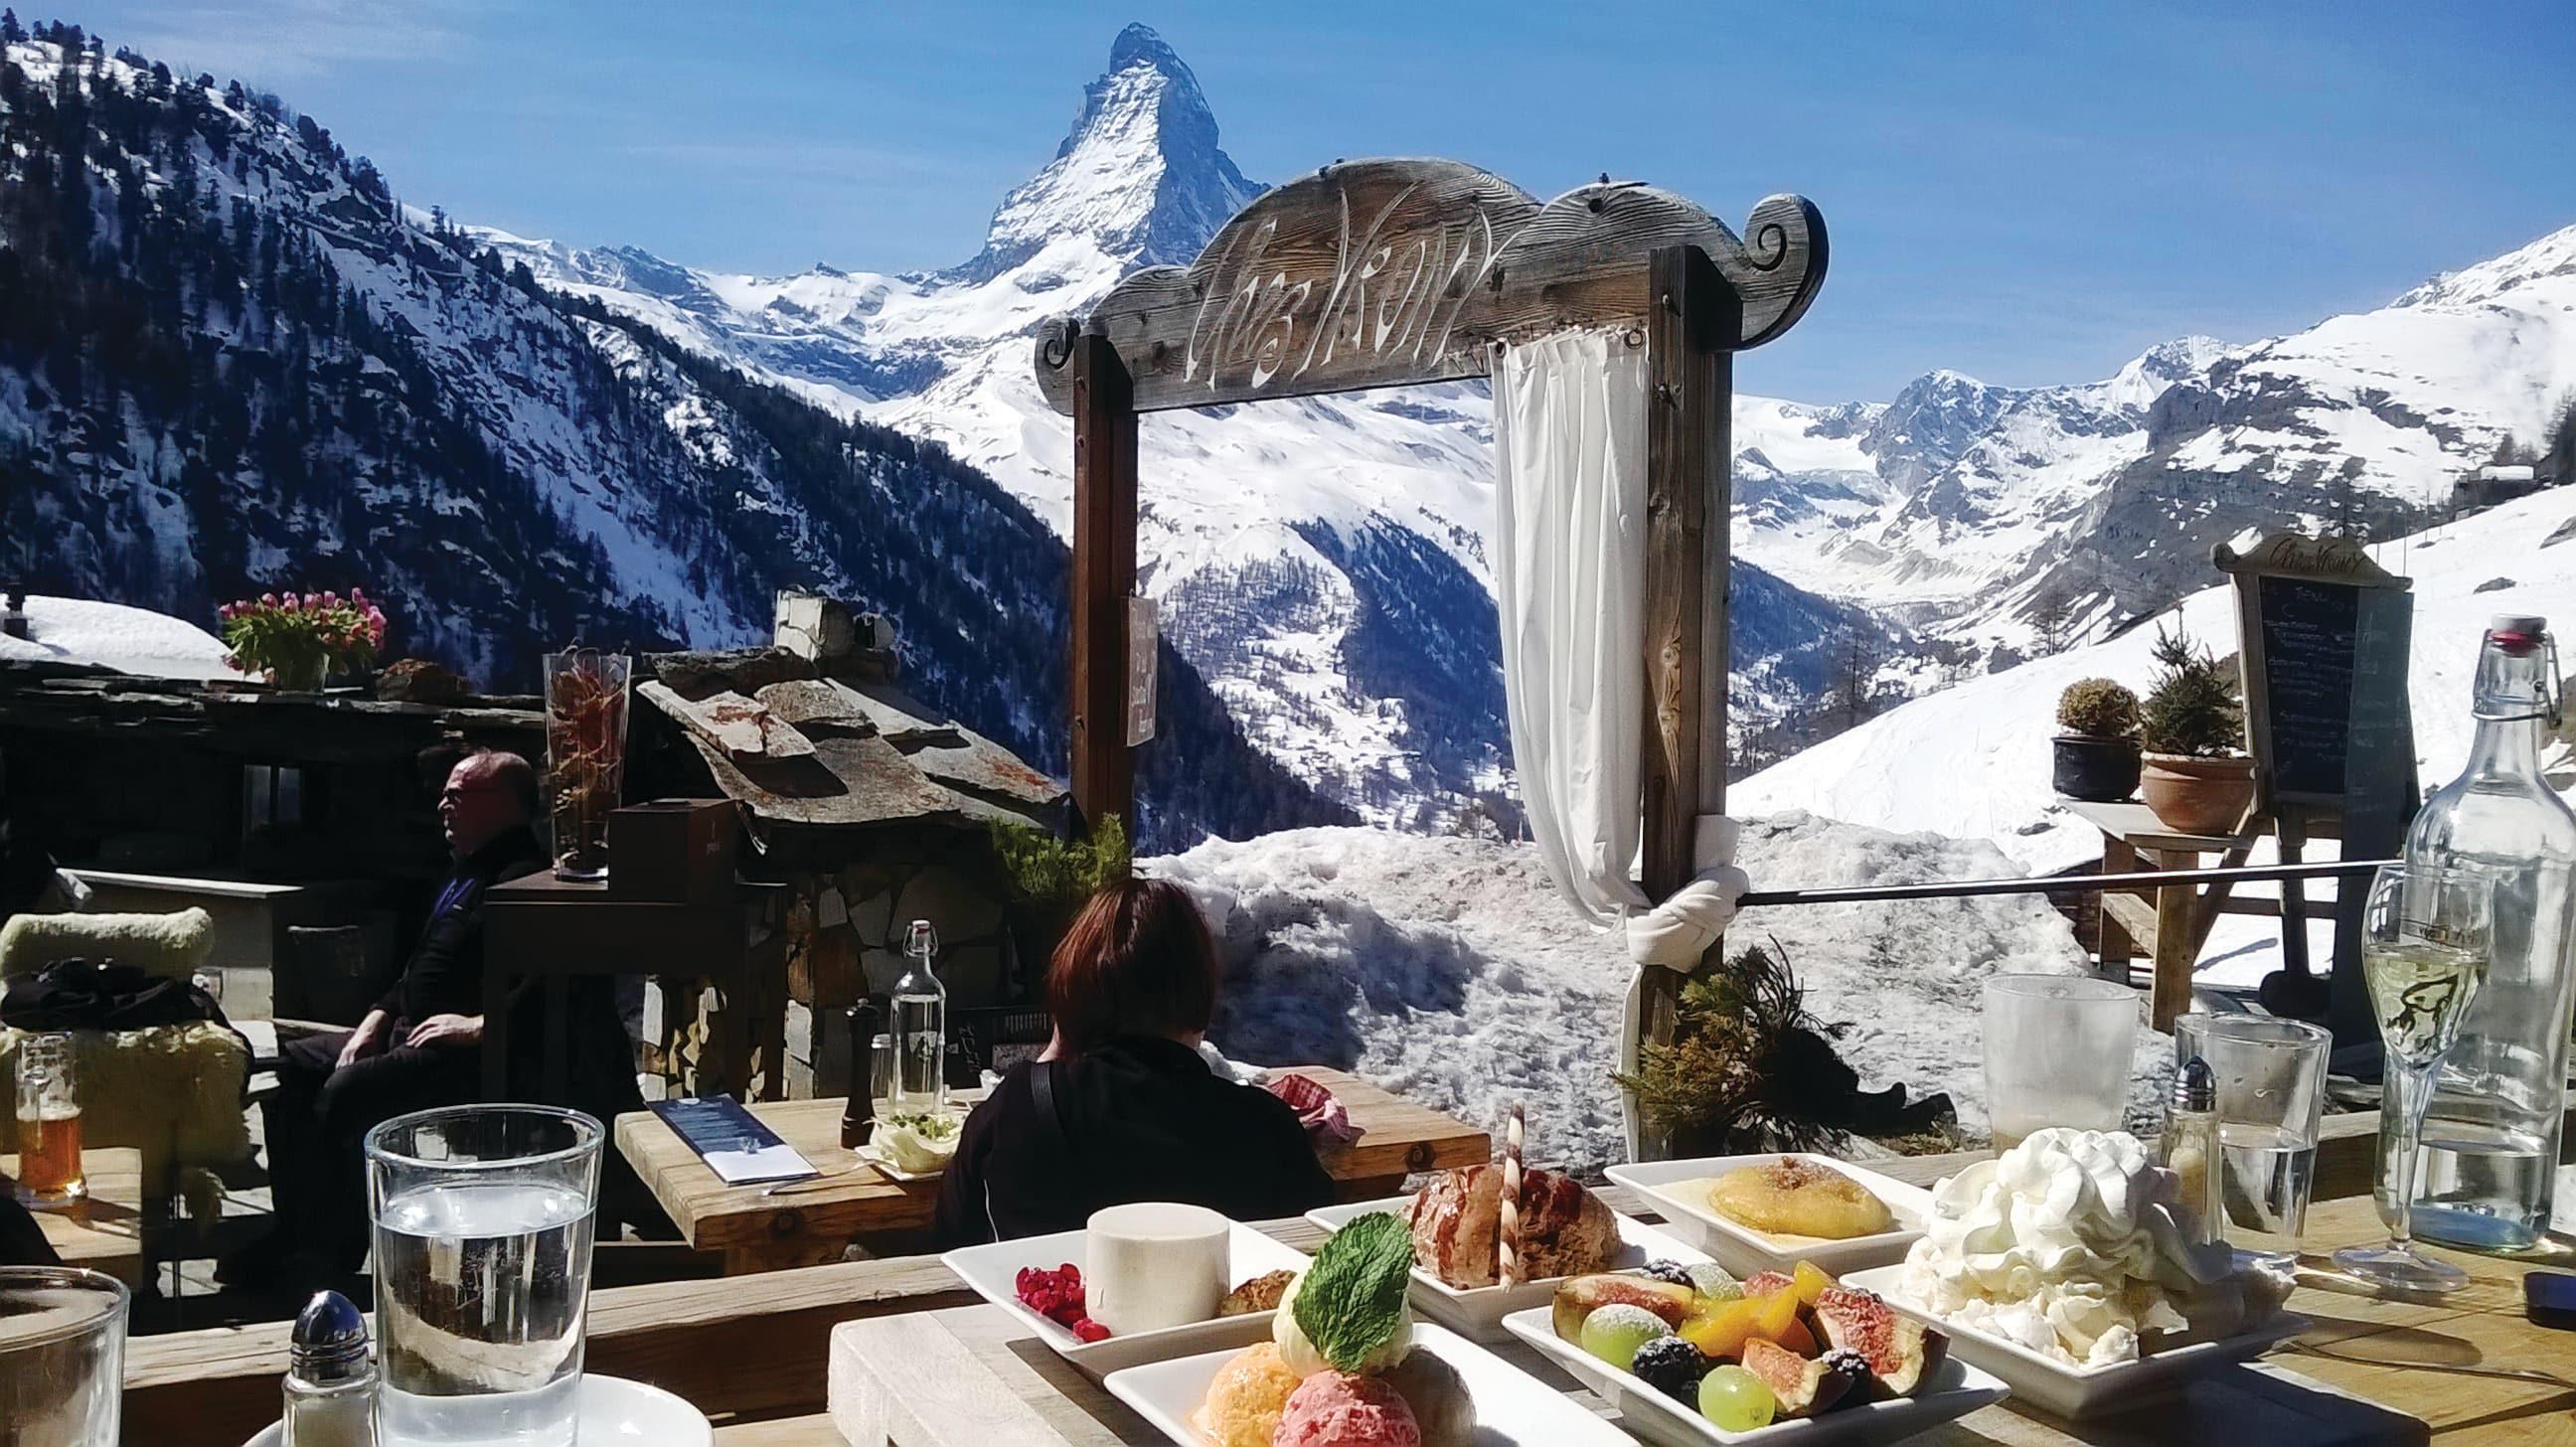 Chez Vrony restaurant in Zermatt